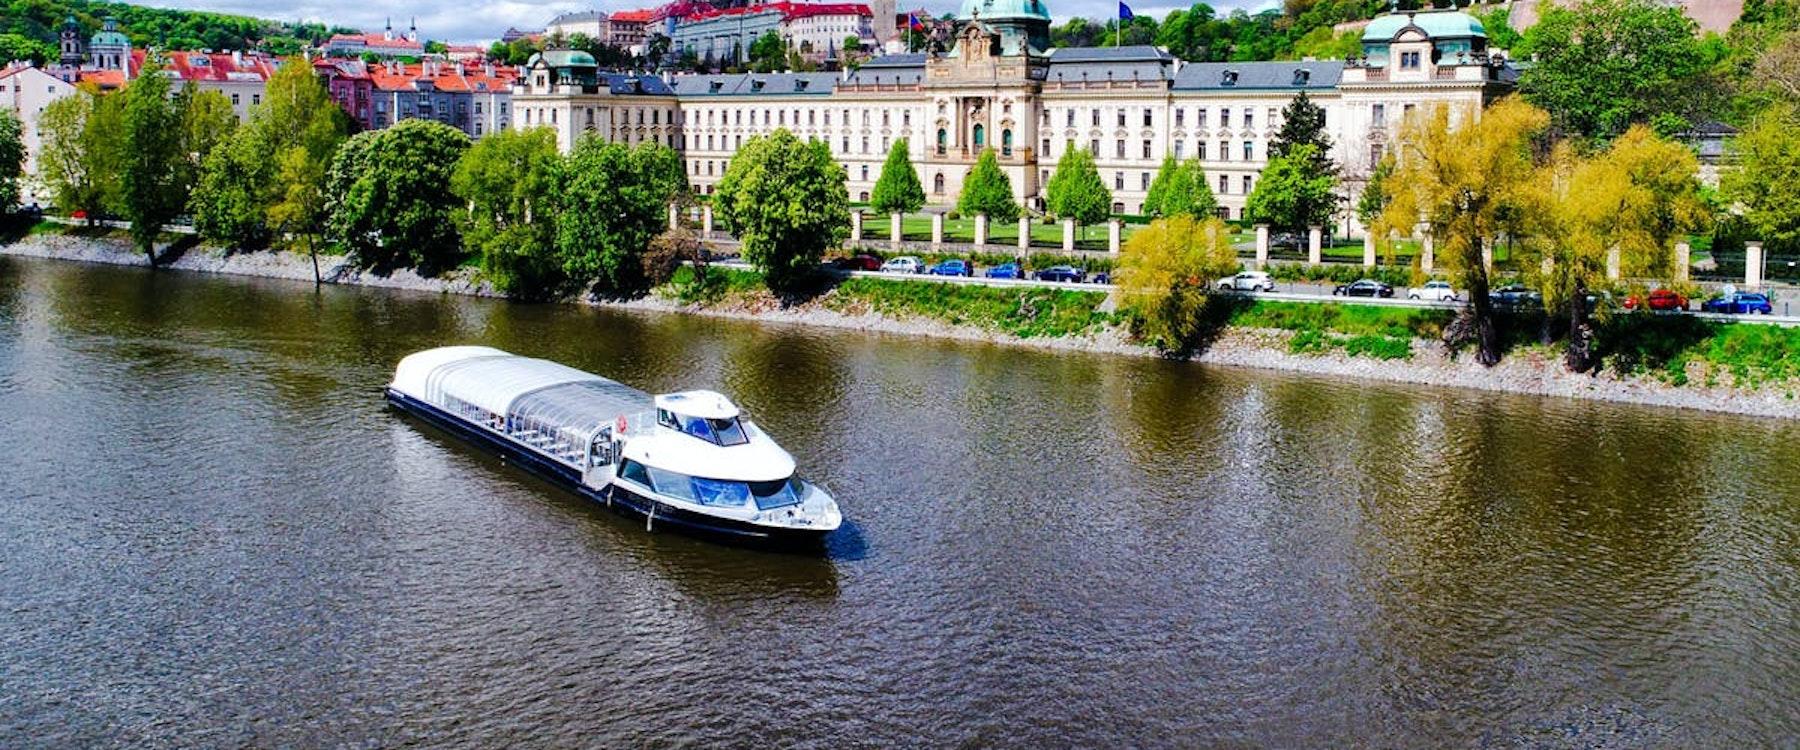 Cruzeiros de Praga